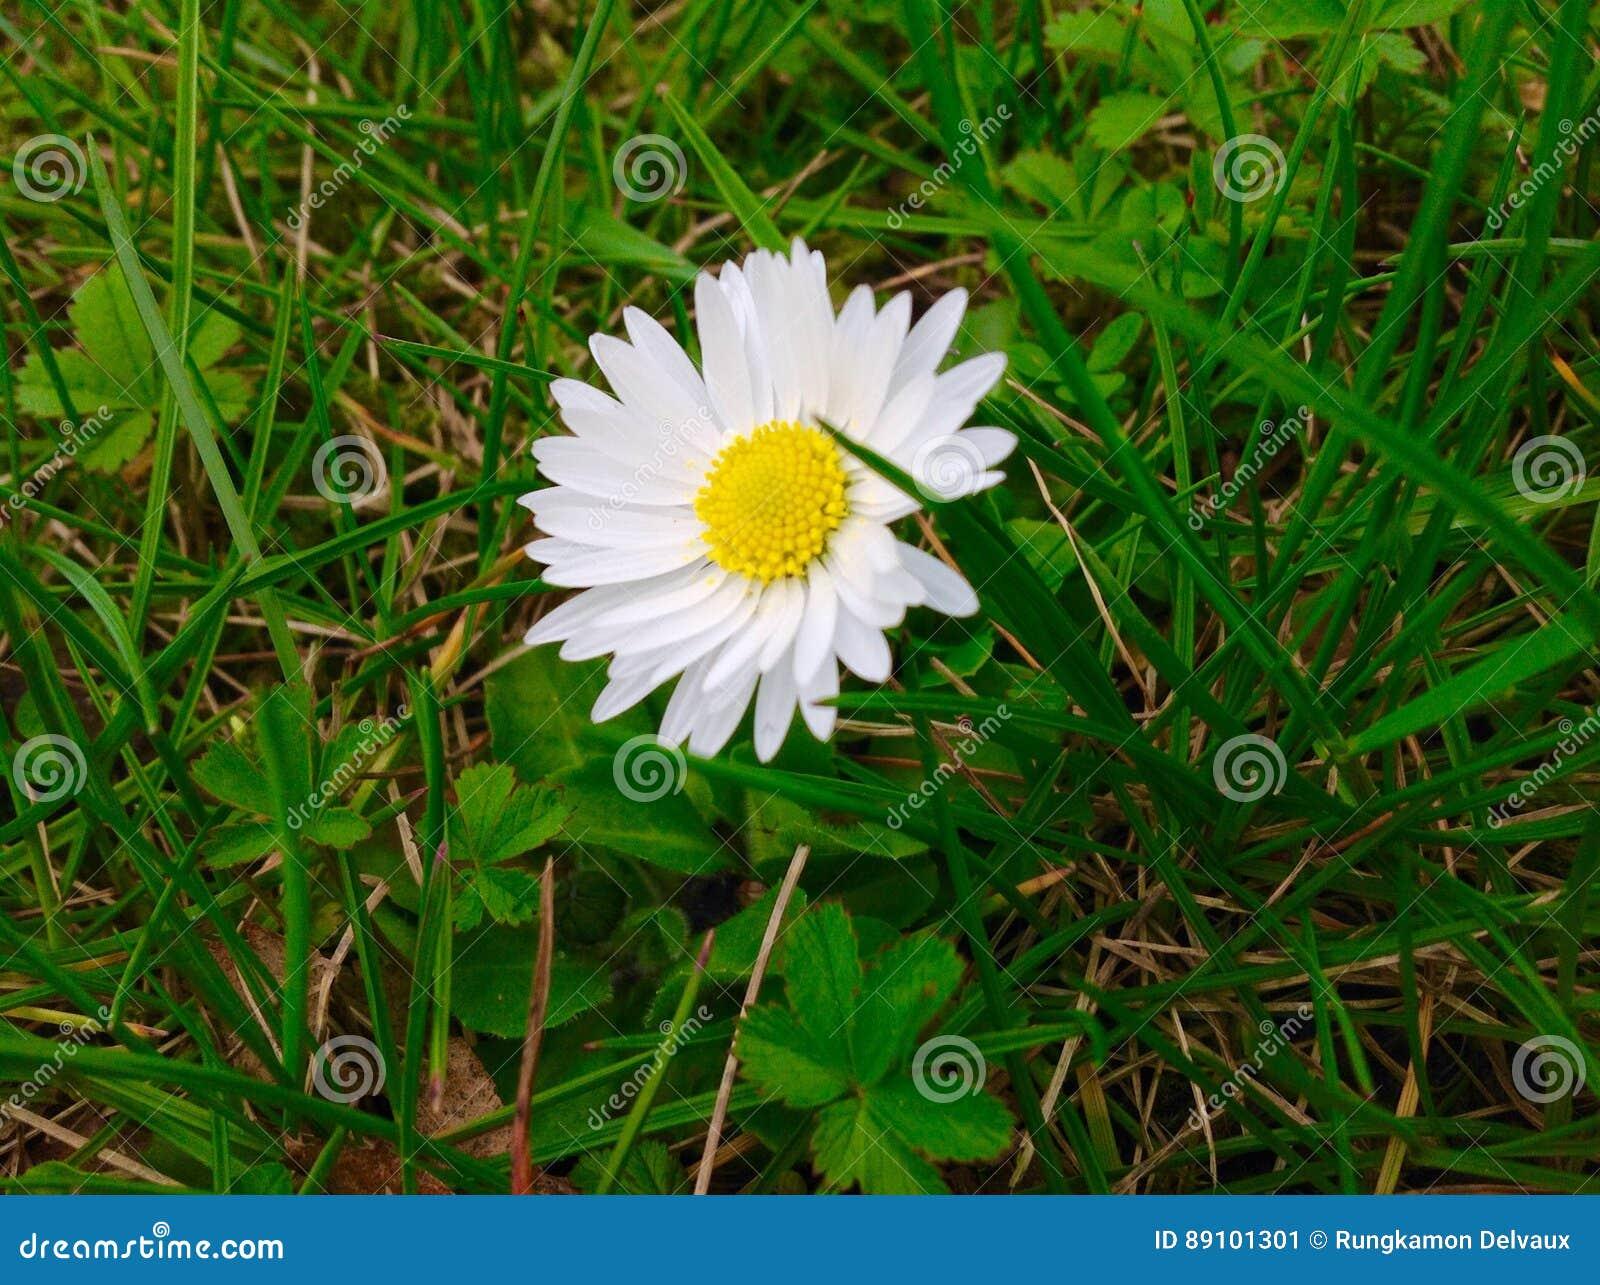 Beautiful daisy flower and green grass background stock image beautiful daisy flower and green grass background izmirmasajfo Choice Image